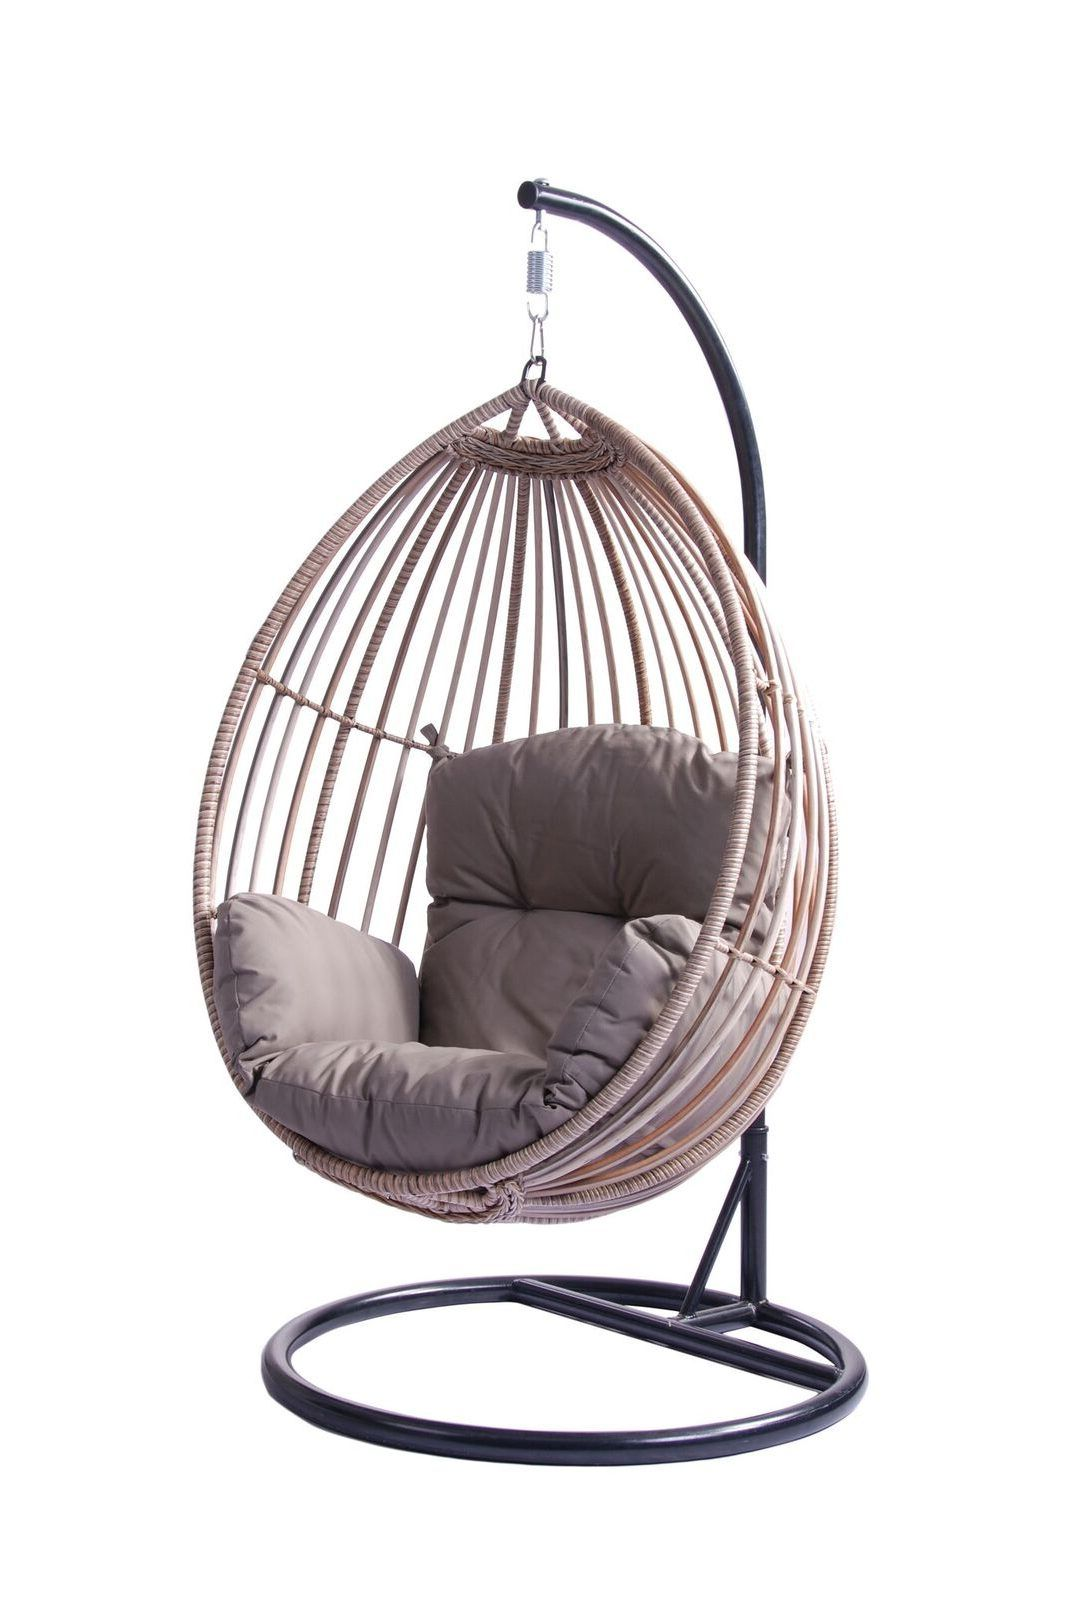 Koala Hanging Egg Chair Natural Look Hanging egg chair